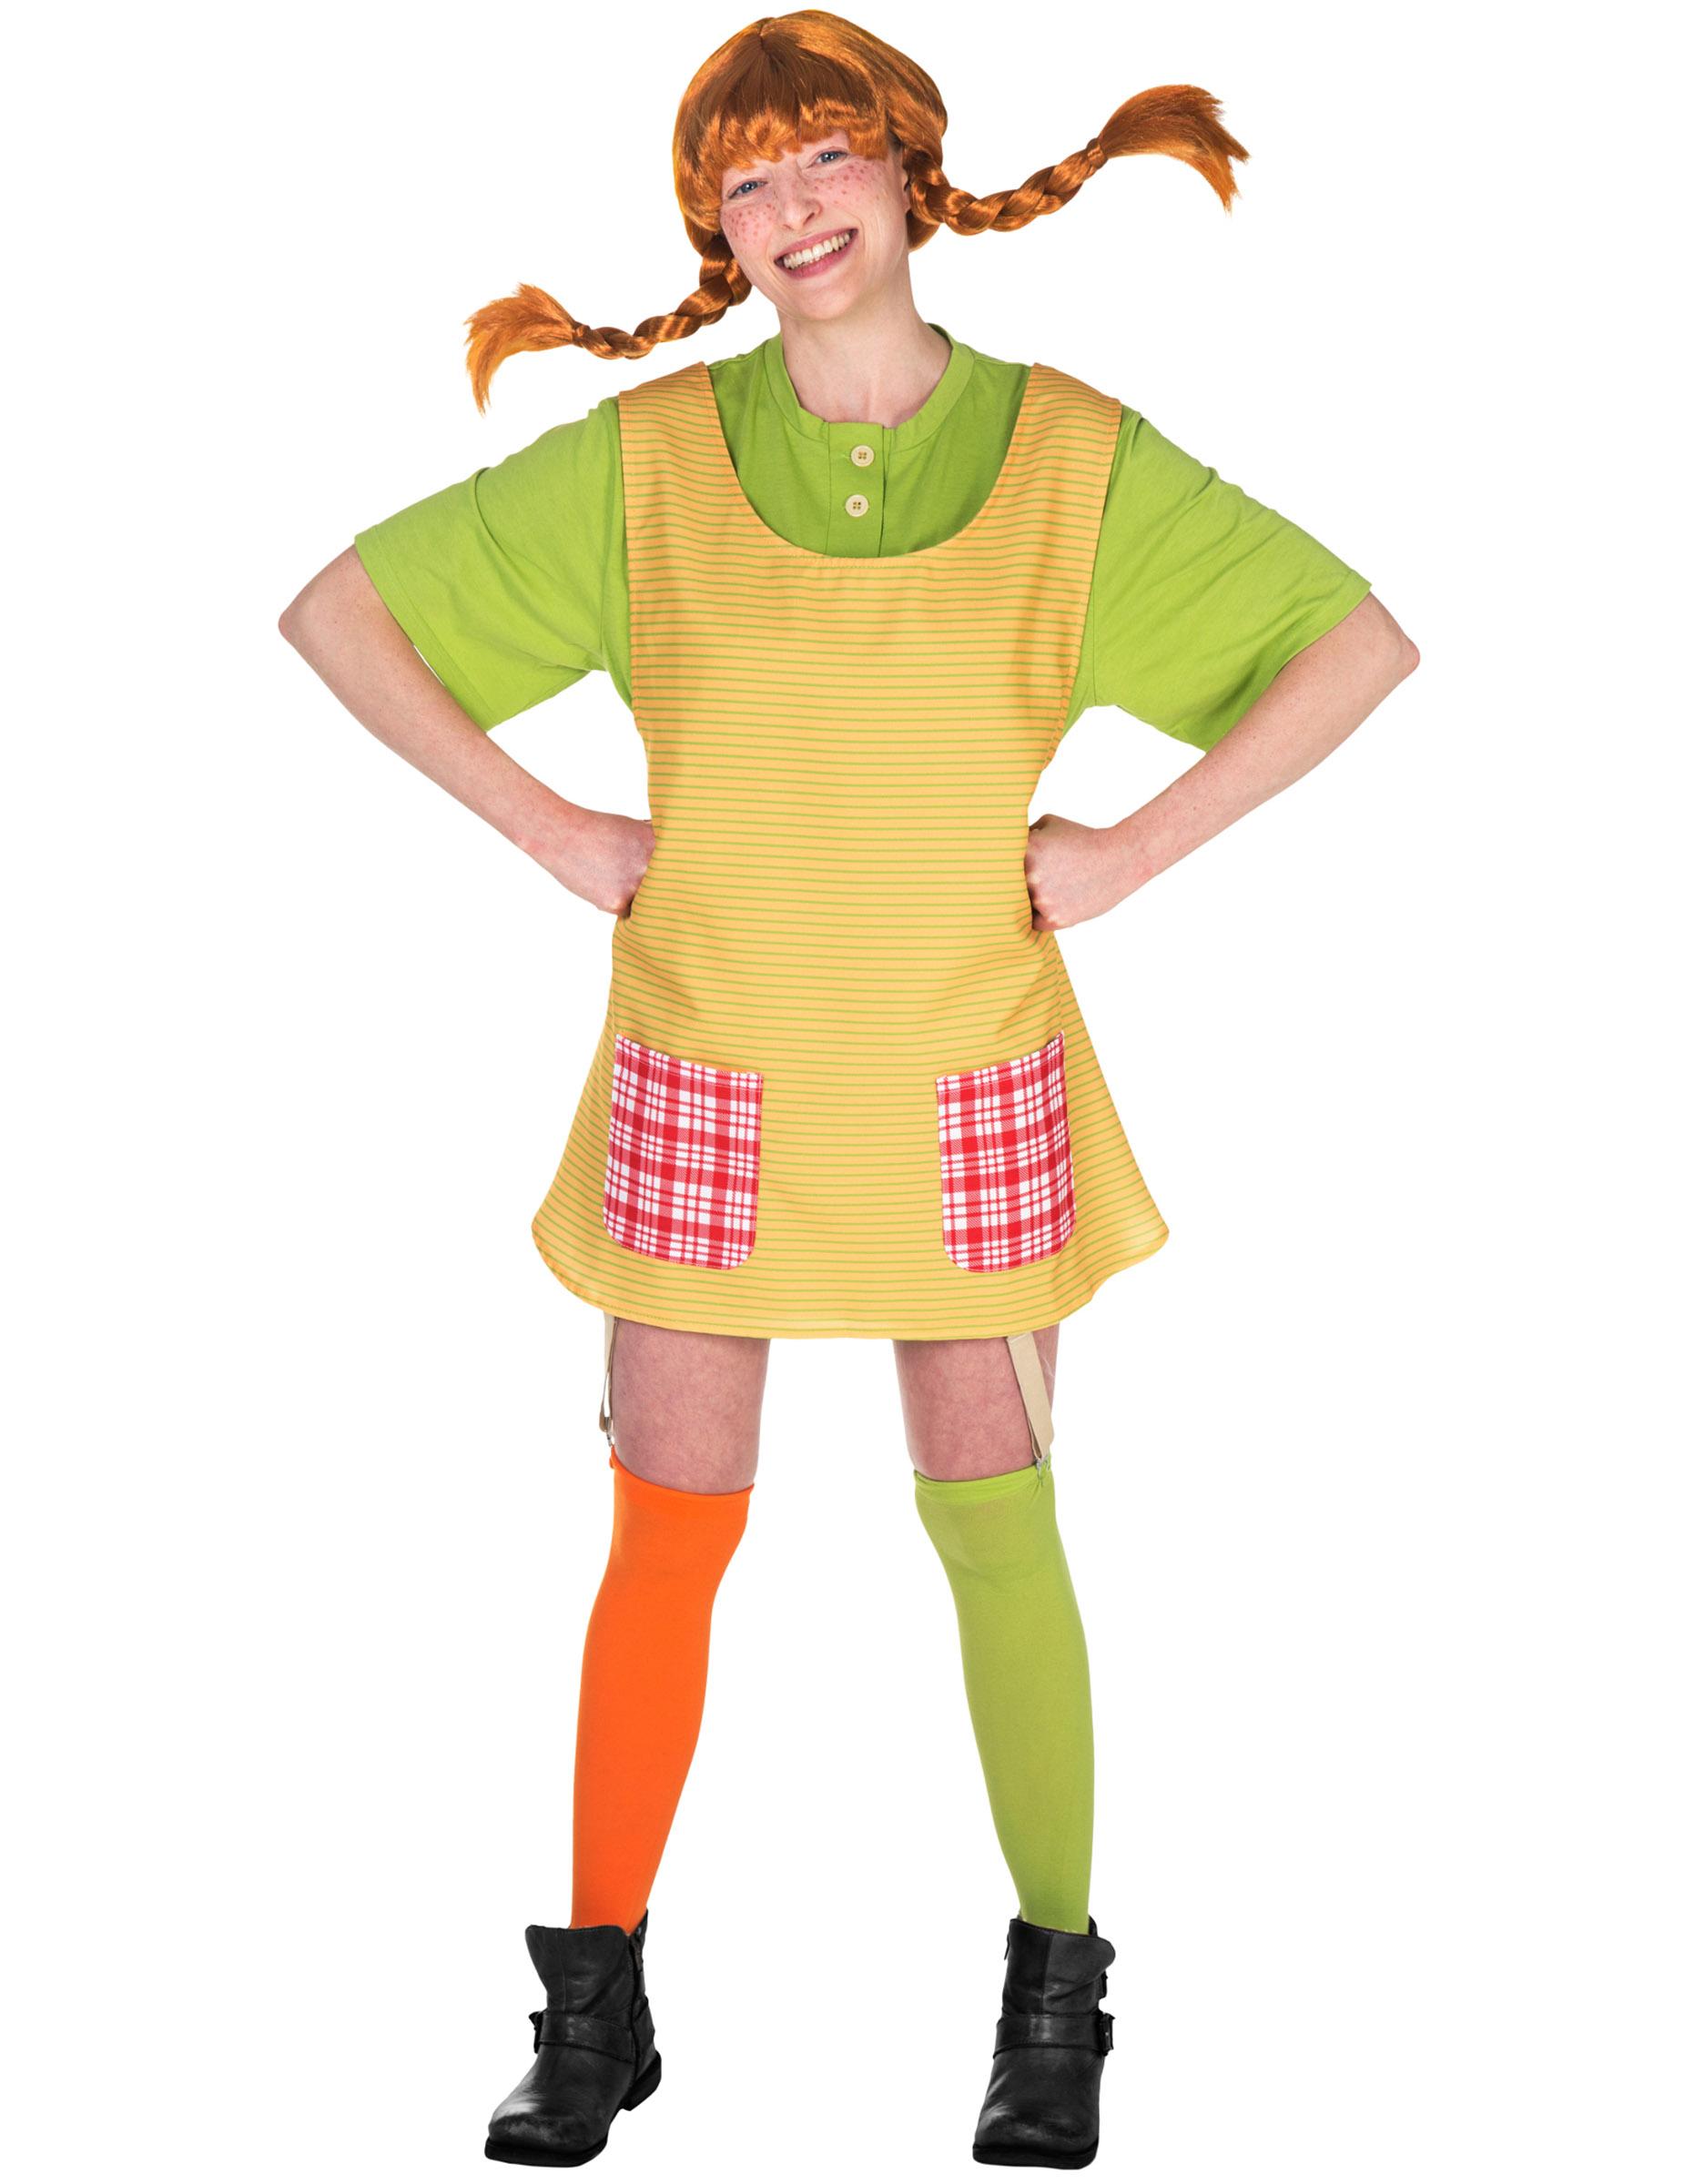 07402d7e89be Pippi langstrømpe™ kostume